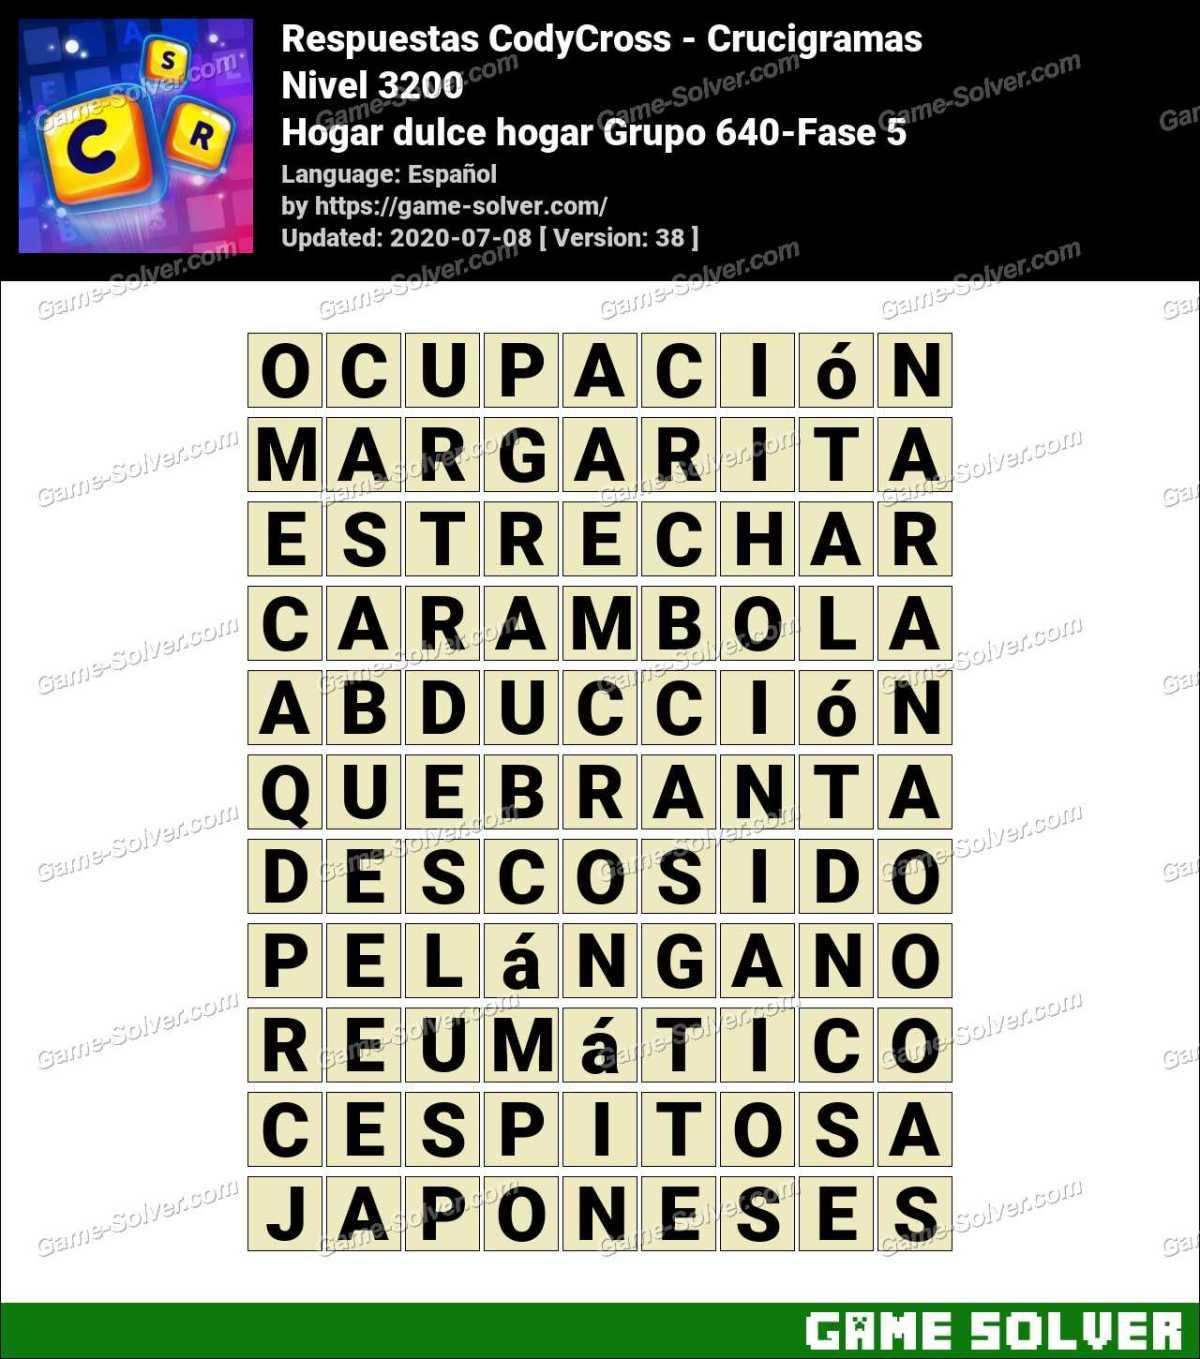 Respuestas CodyCross Hogar dulce hogar Grupo 640-Fase 5